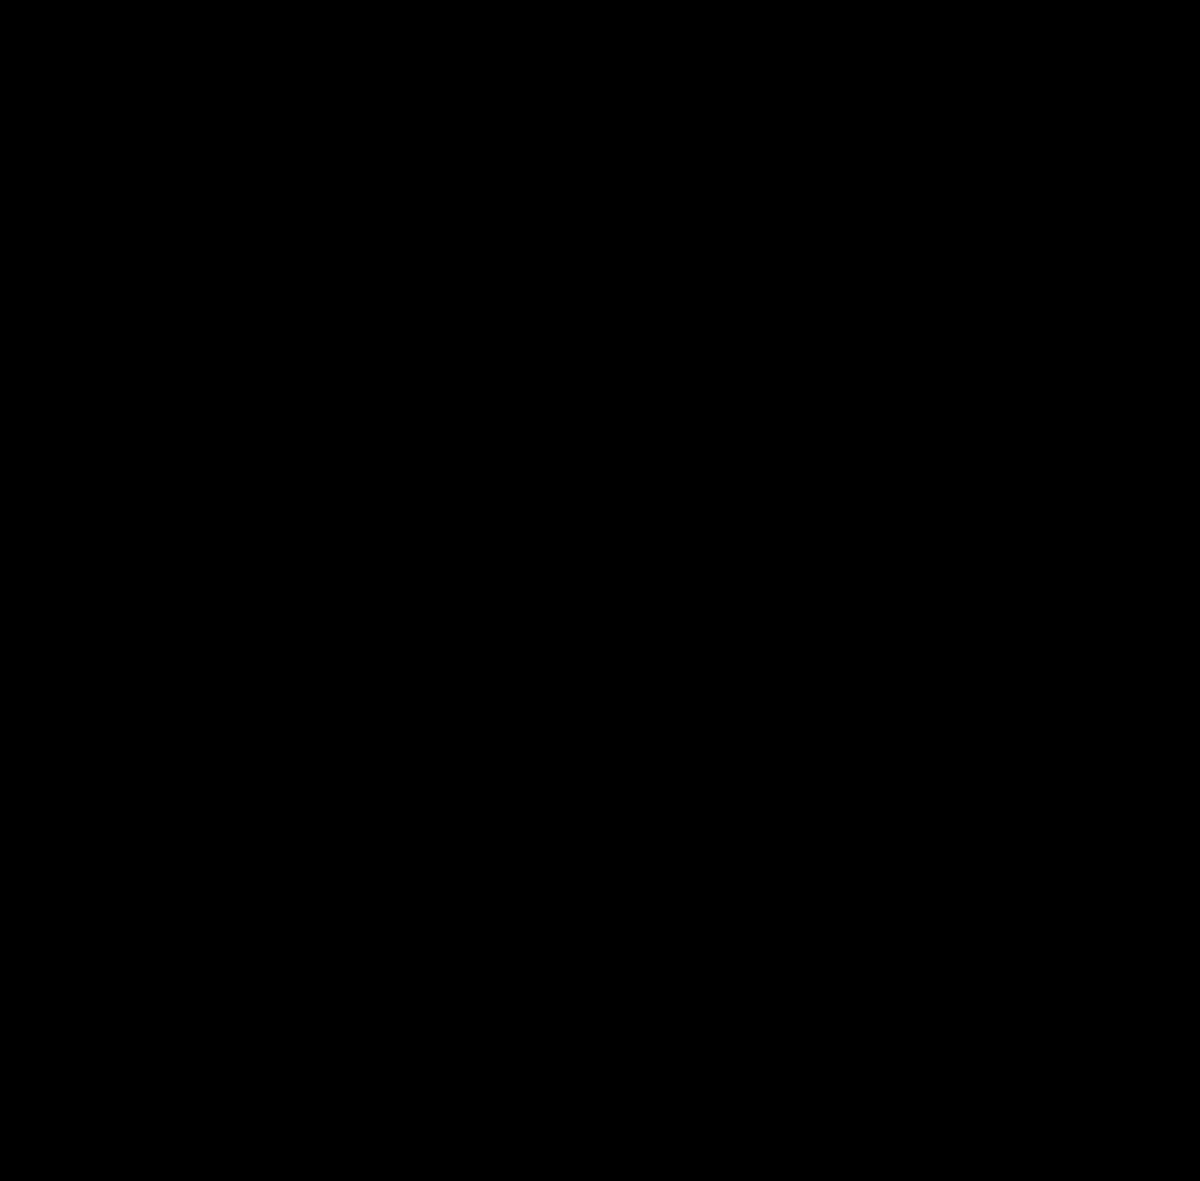 U9gzYQa88HJHAUIg9Q2V8Yau-VKvd80pkP-92D6S